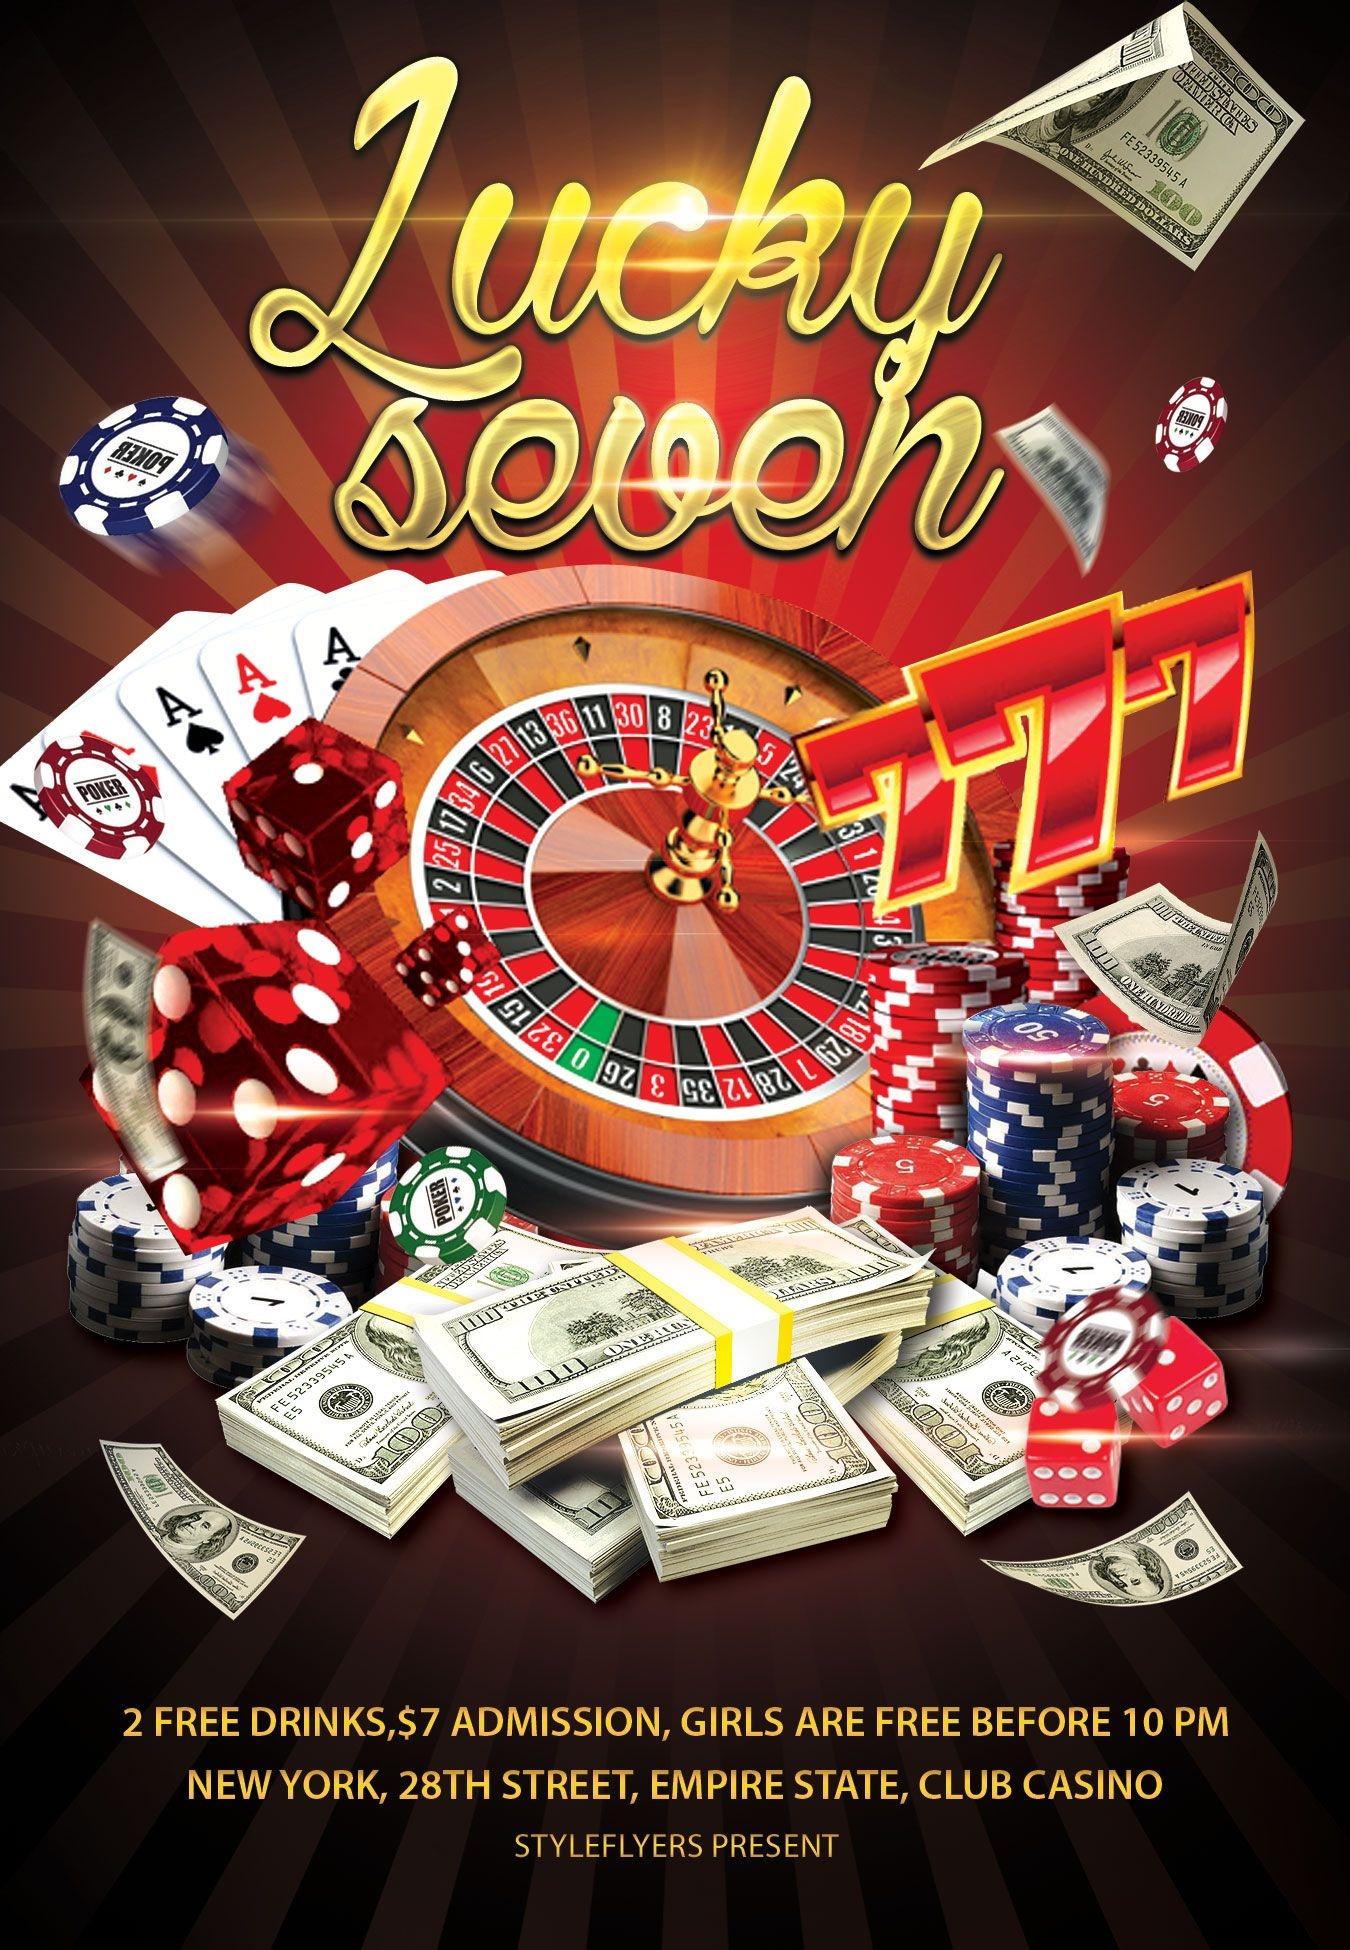 955% Deposit Match Bonus at Party Casino